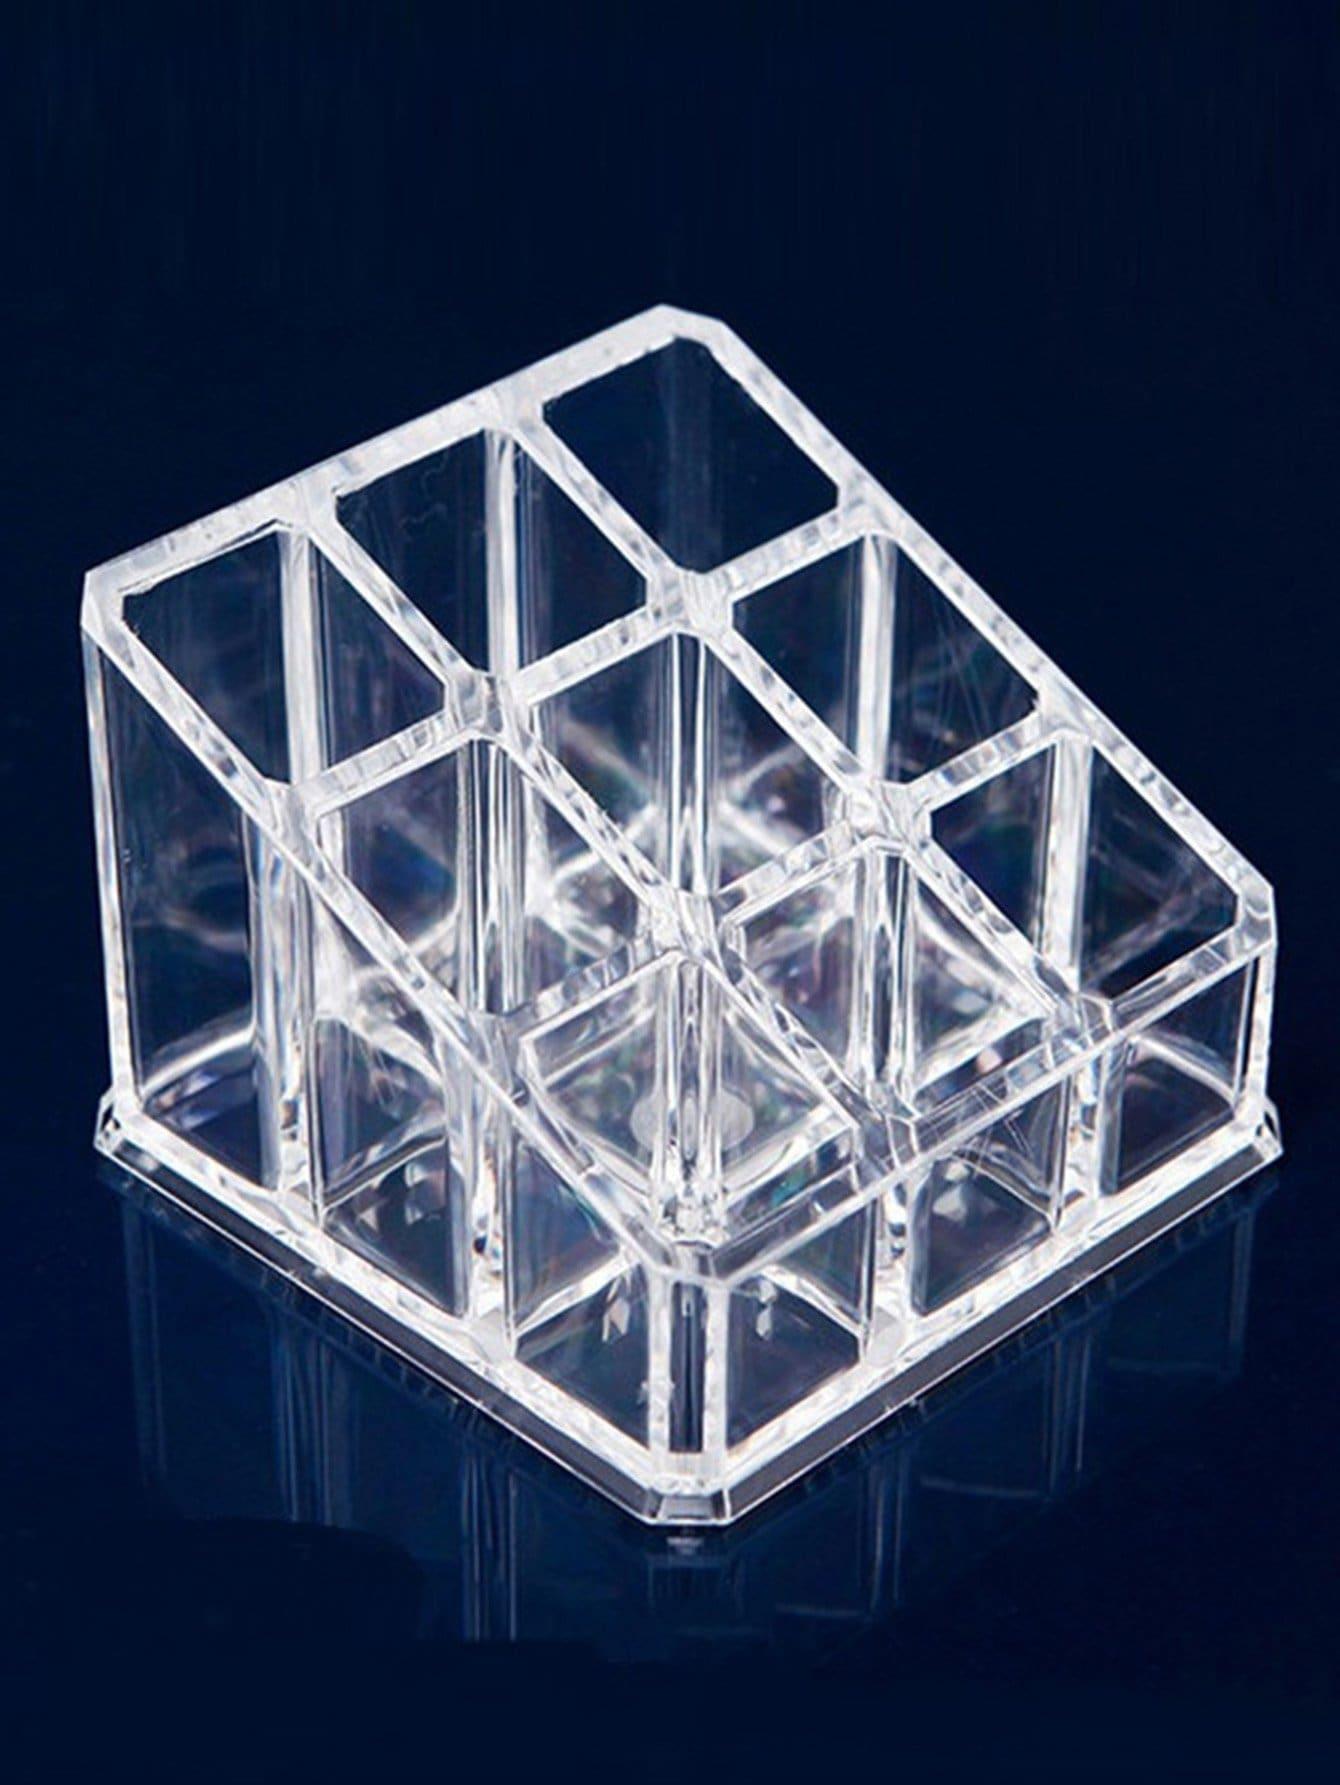 9 Compartment Clear Organizer